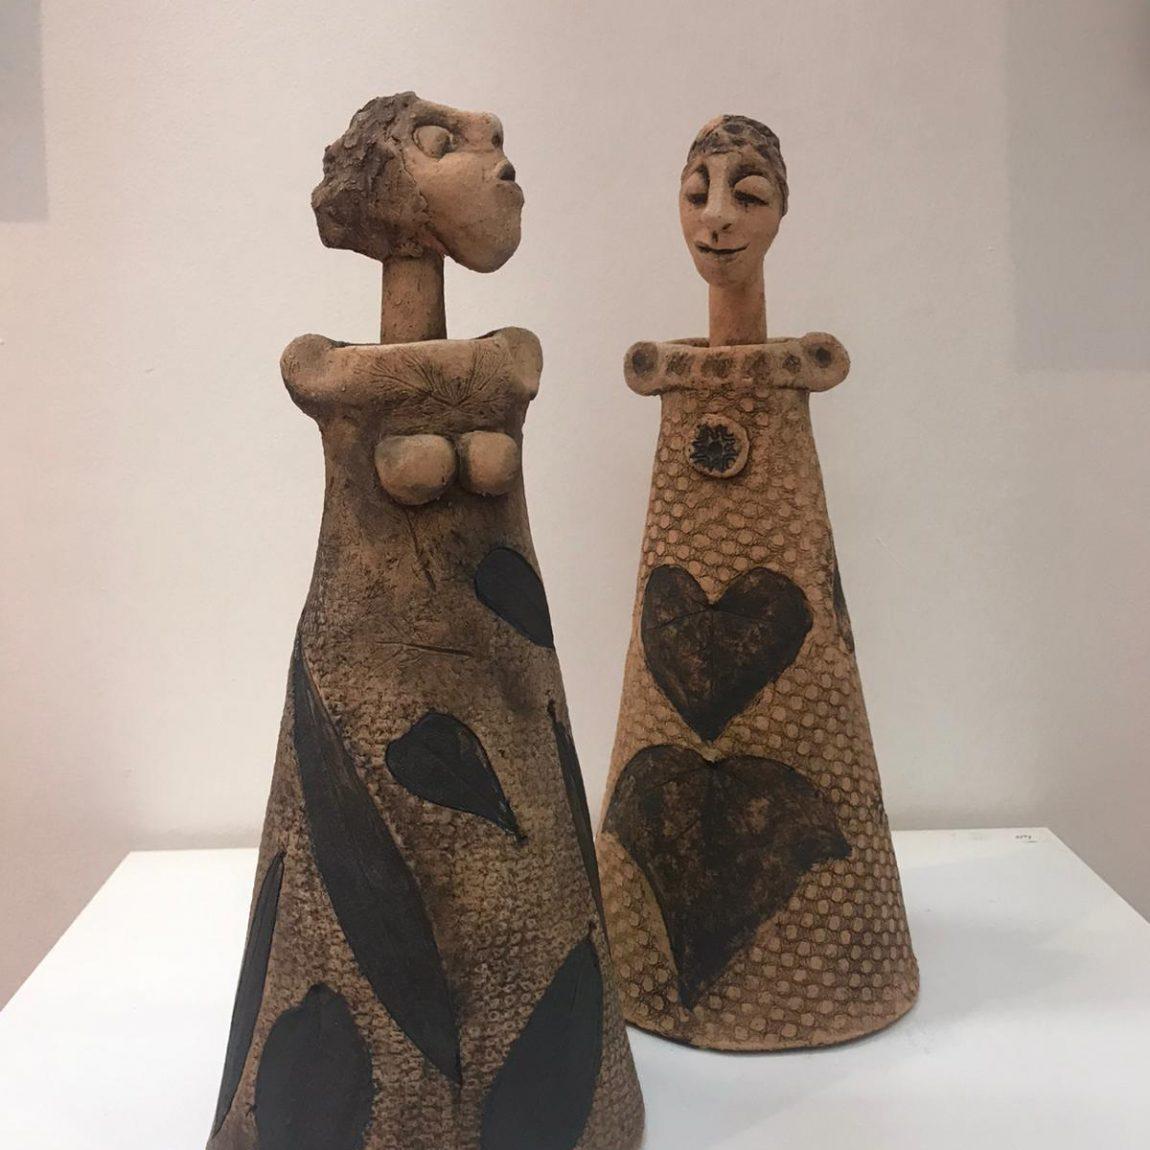 Ümit Z.Bayındır-Teknik:Seramik - heykel  Birim Fiyat:2.065 TL